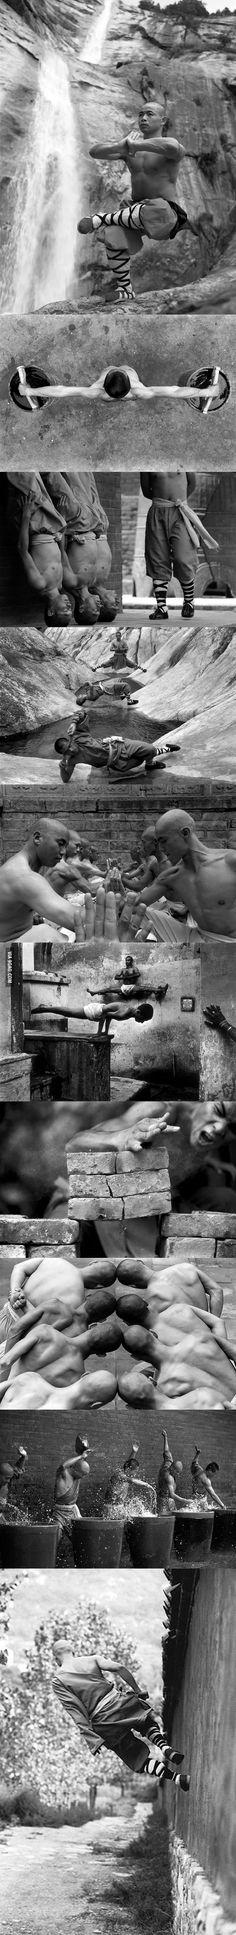 The Dedication of Shaolin Monks: Mind over Matter